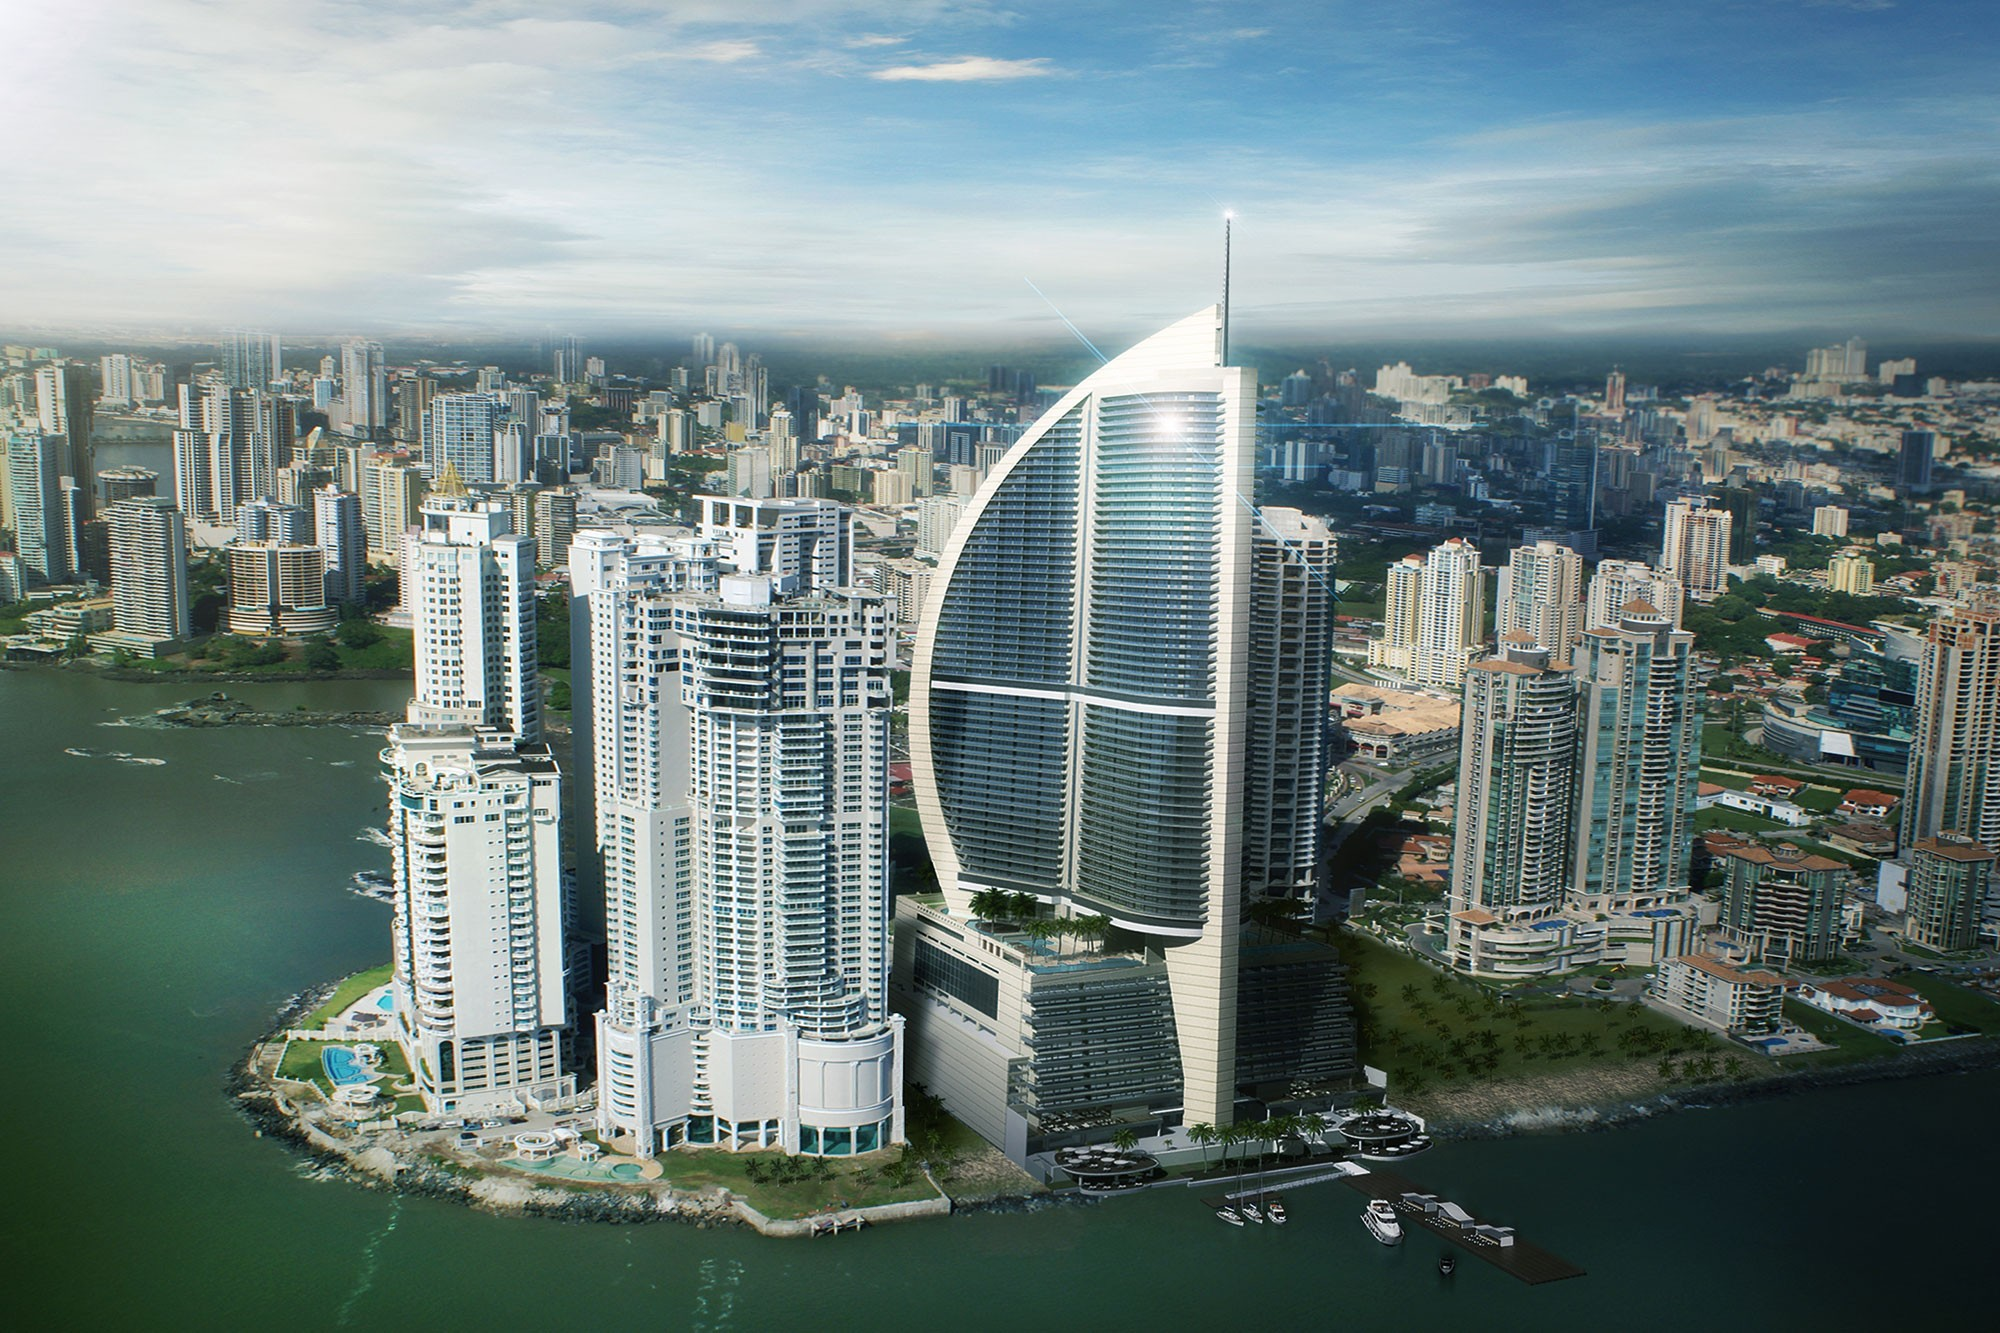 Photo Source: Trump International Hotel & Tower, Panama